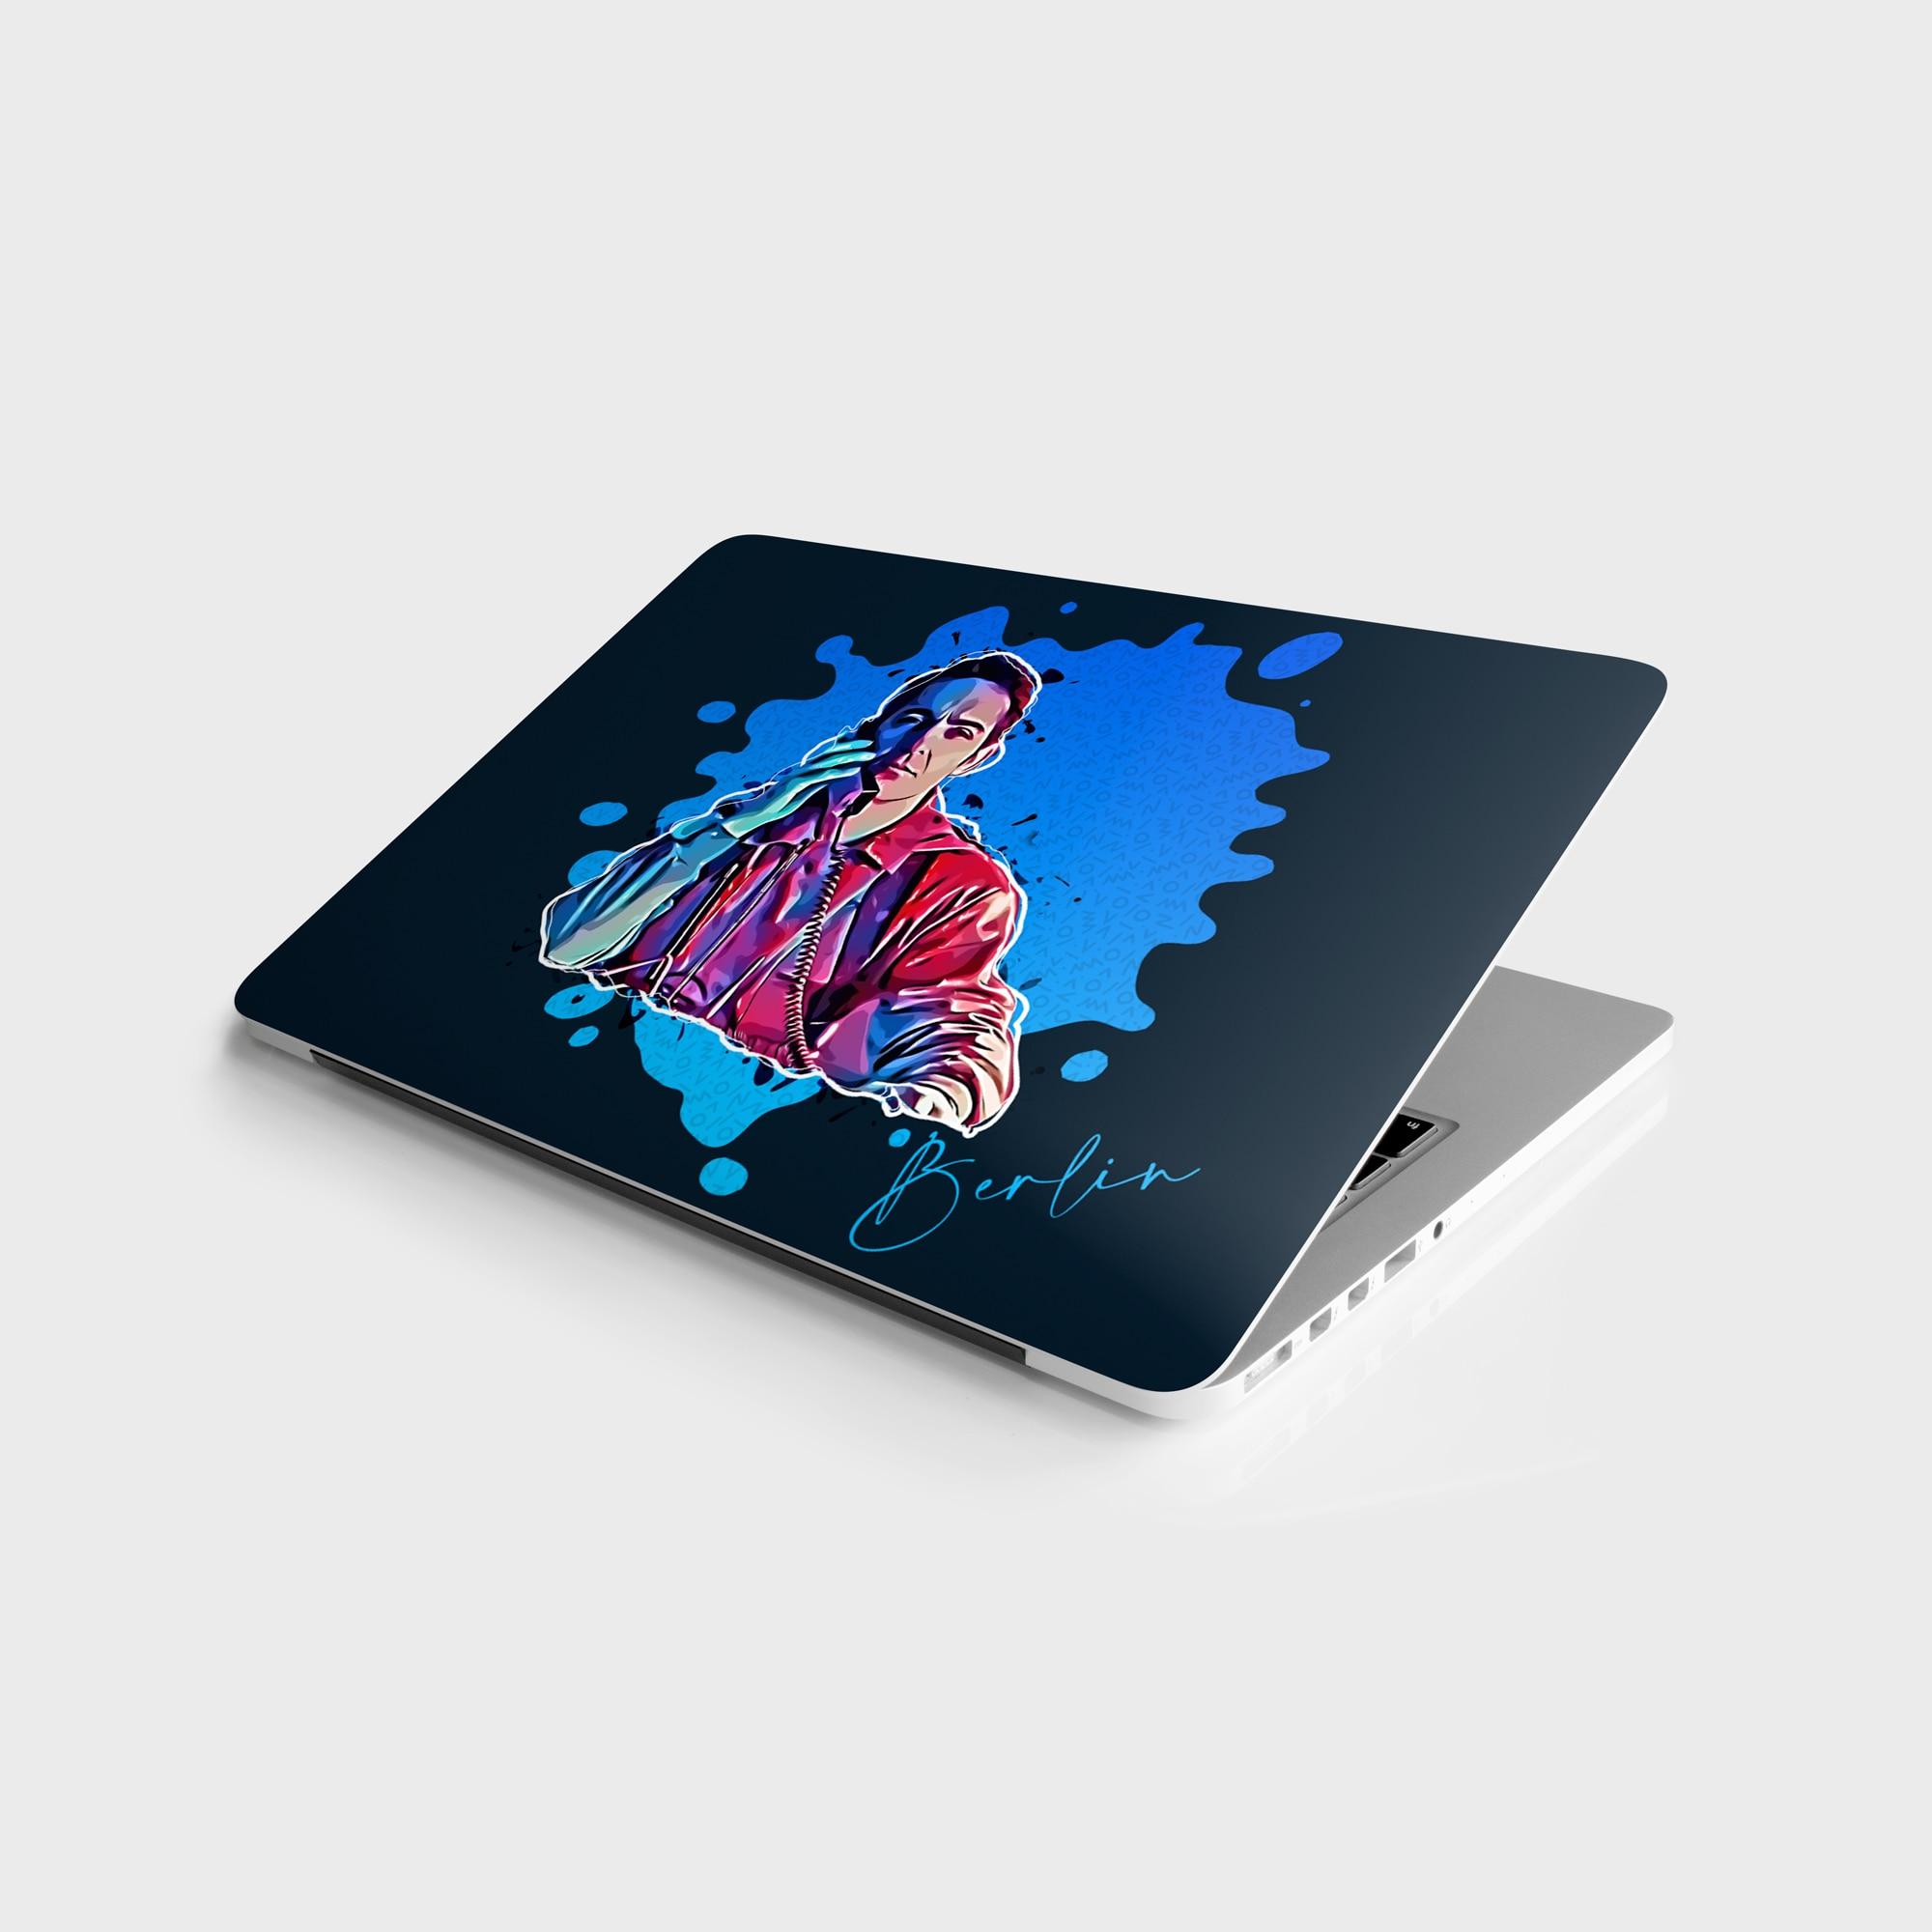 "Sticker Master La Casa De Papel Berlin Cartoon Universal Sticker Laptop Vinyl Sticker Skin Cover For 10 12 13 14 15.4 15.6 16 17 19 ""Inc Notebook decal for Macbook,asus,Acer,Hp,Lenovo,Huawei,Dell,Msi,Apple,Toshiba,Comp"